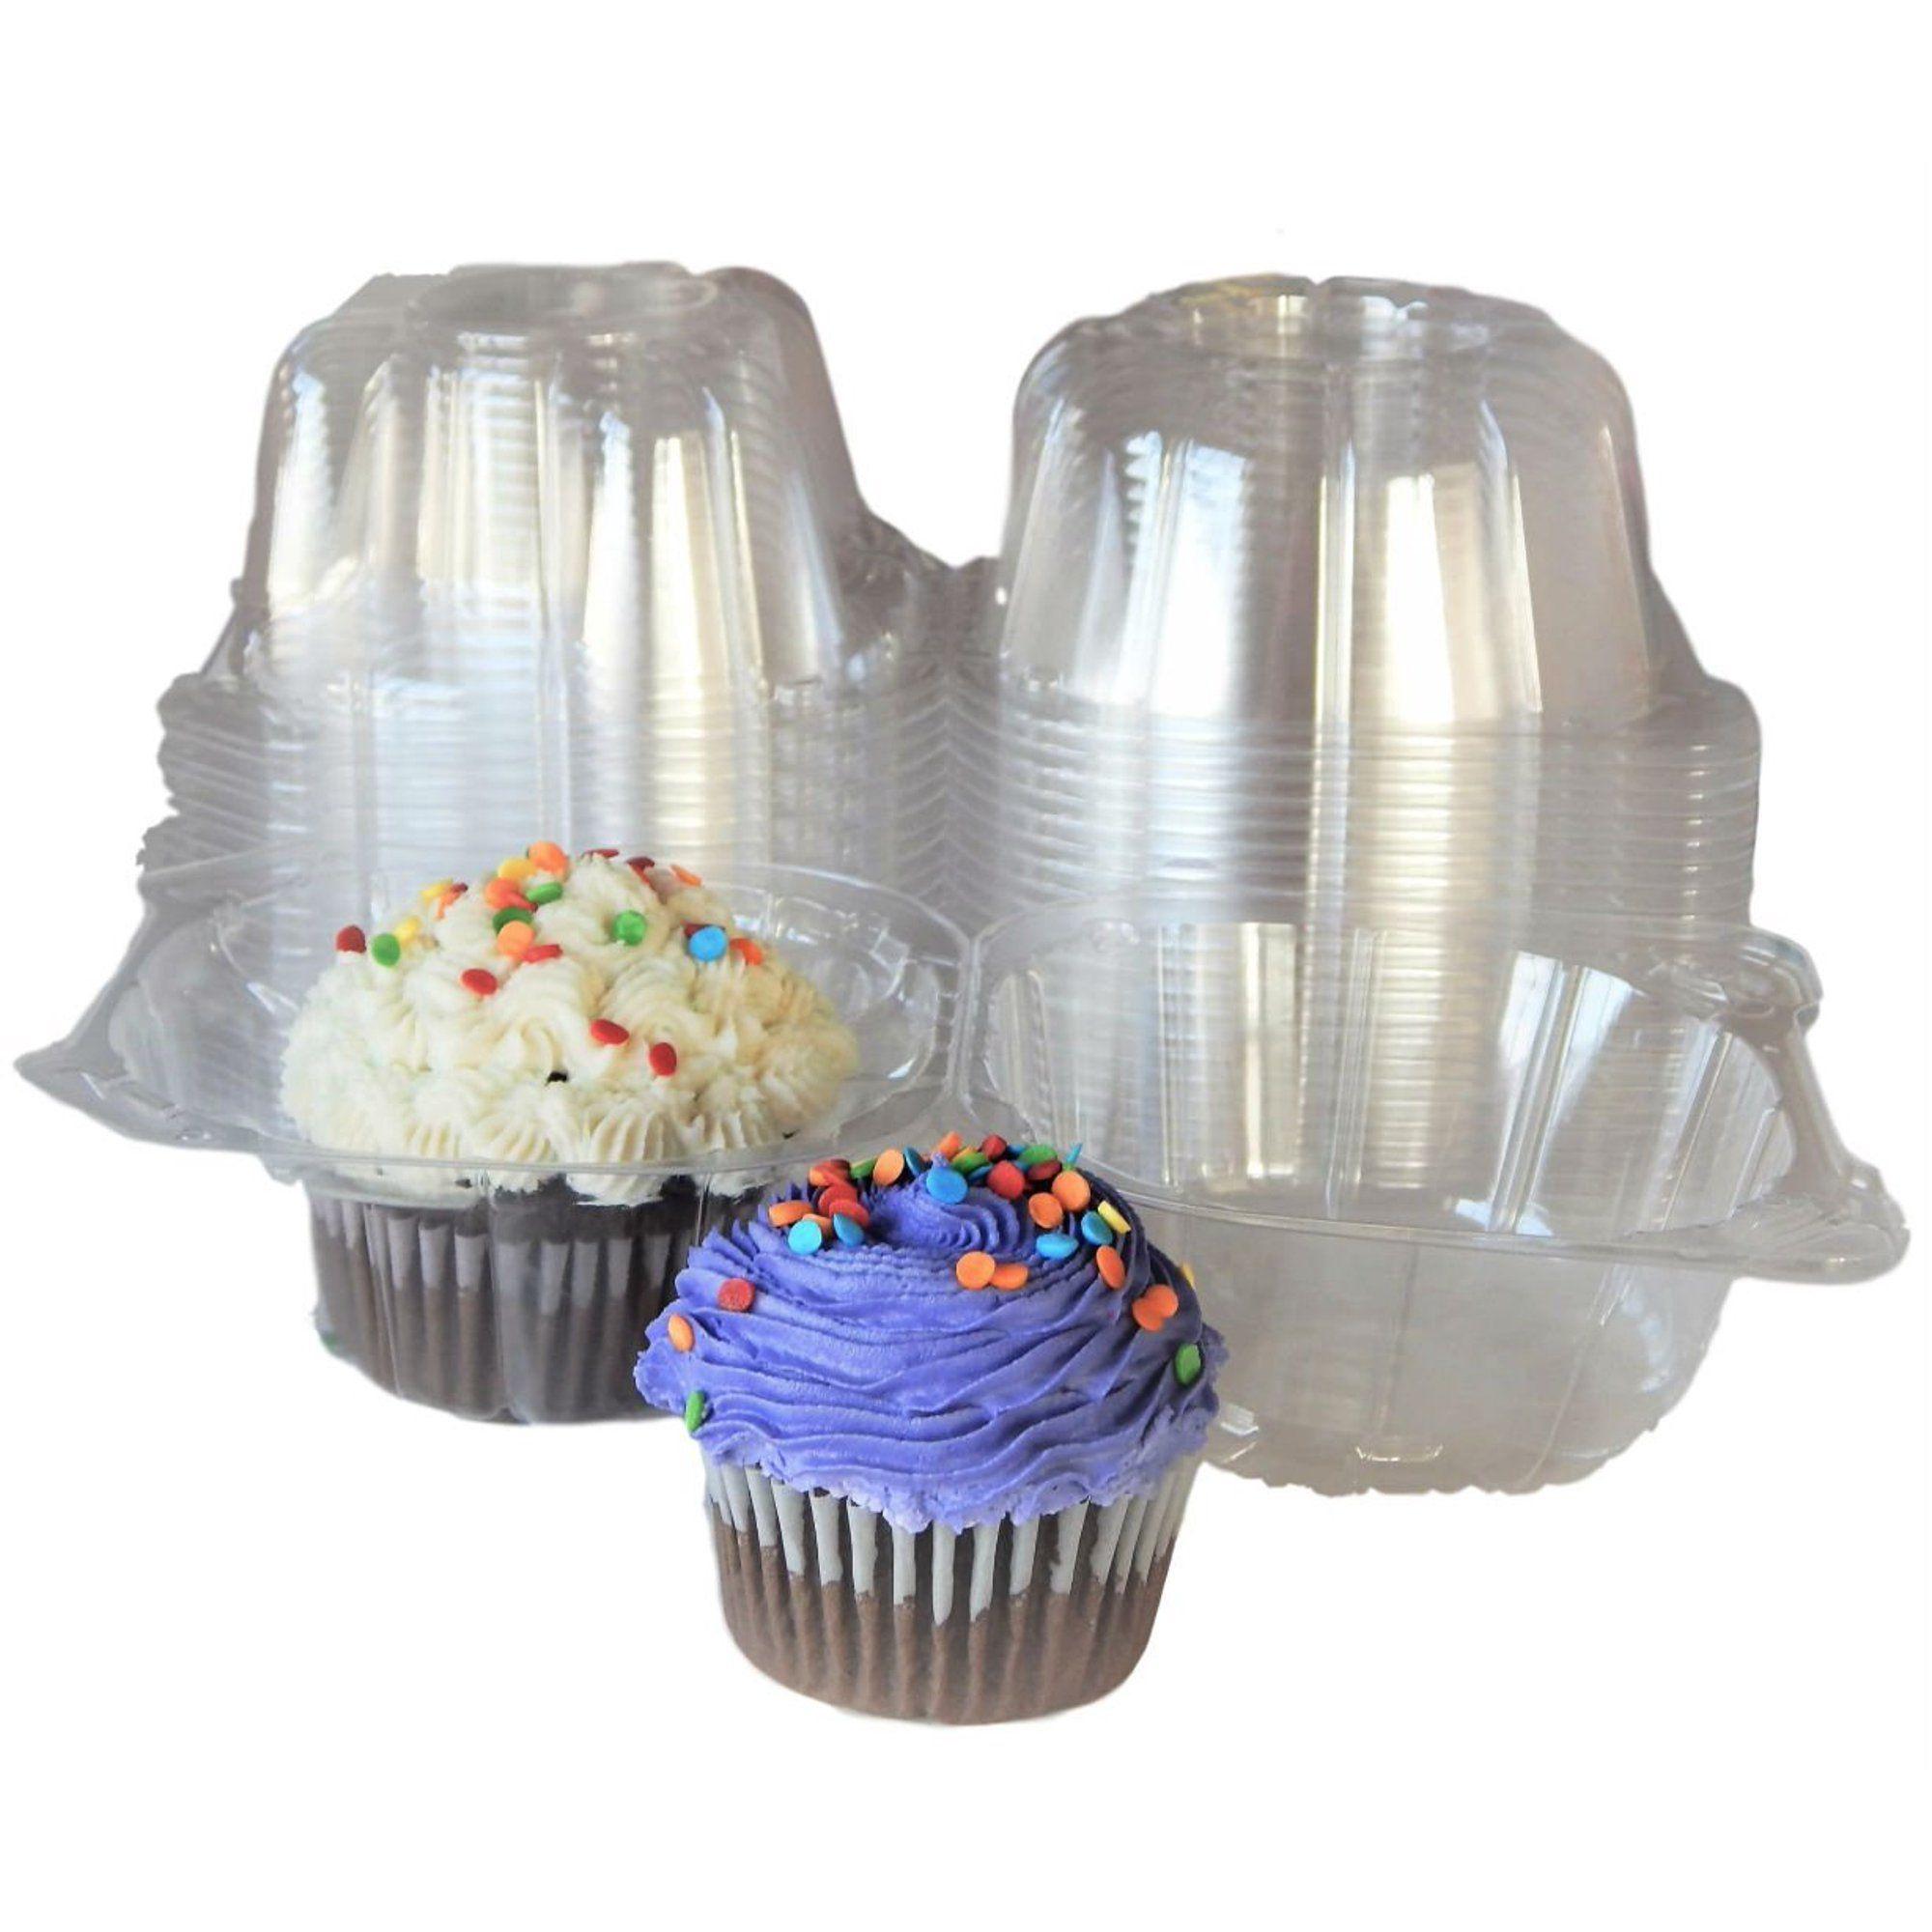 disposable cake carrier walmart